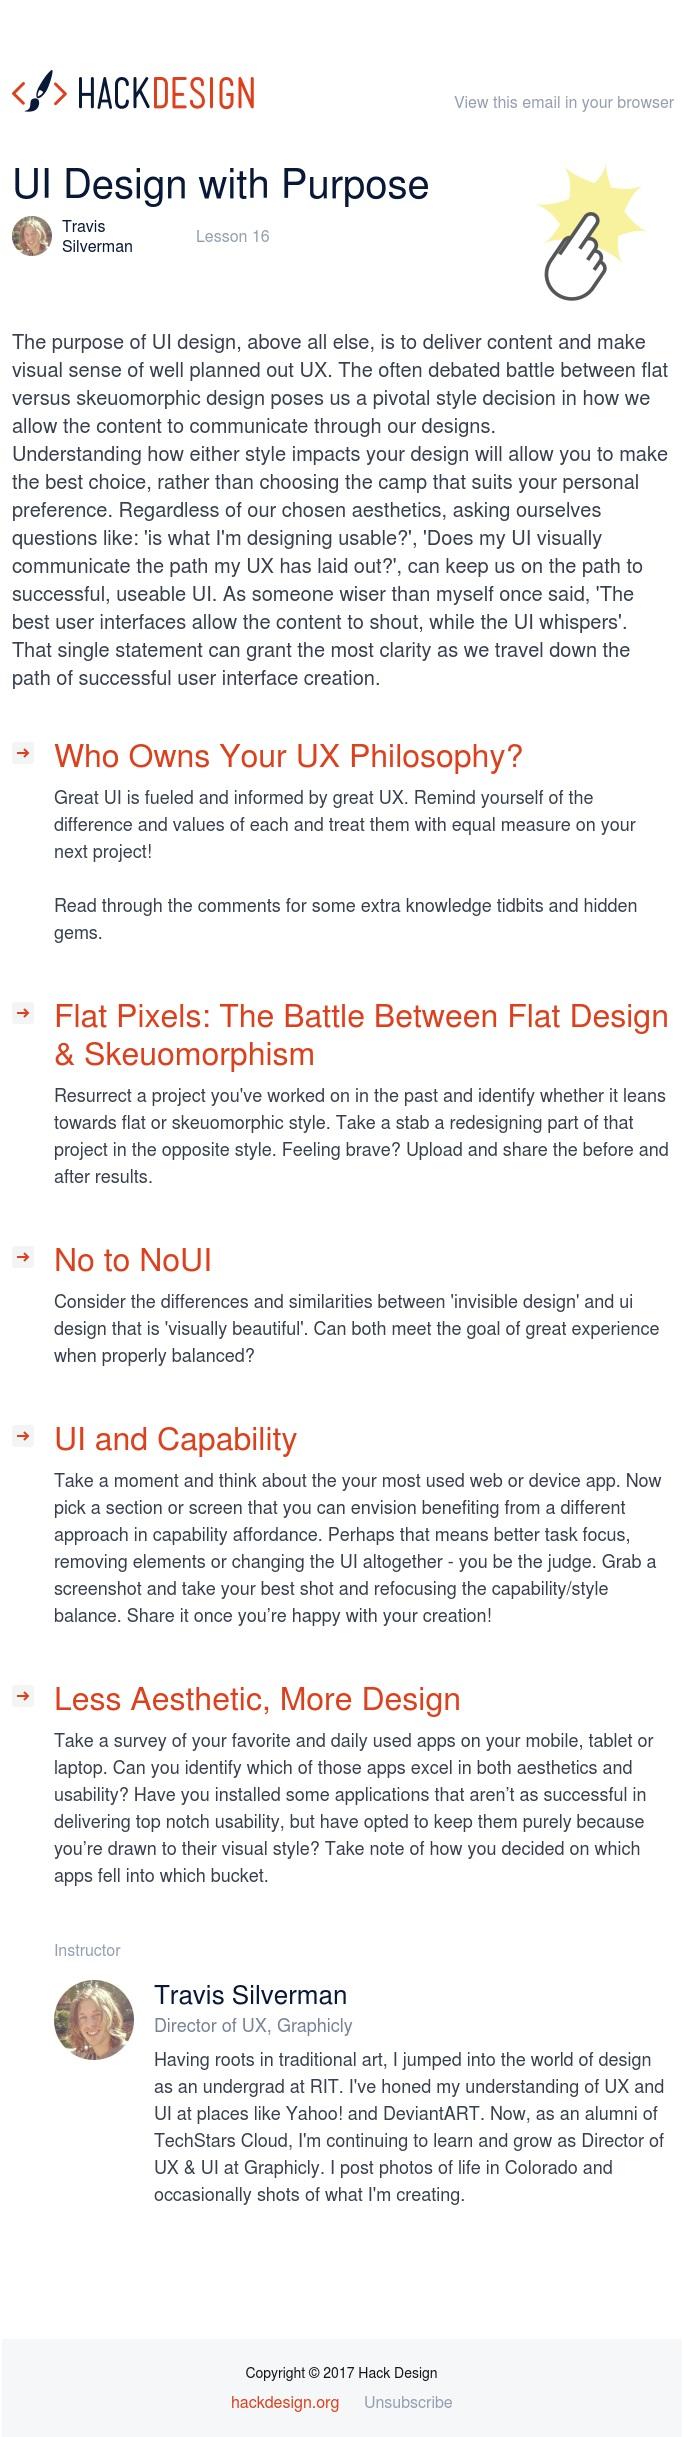 Lesson 16 - UI Design with Purpose